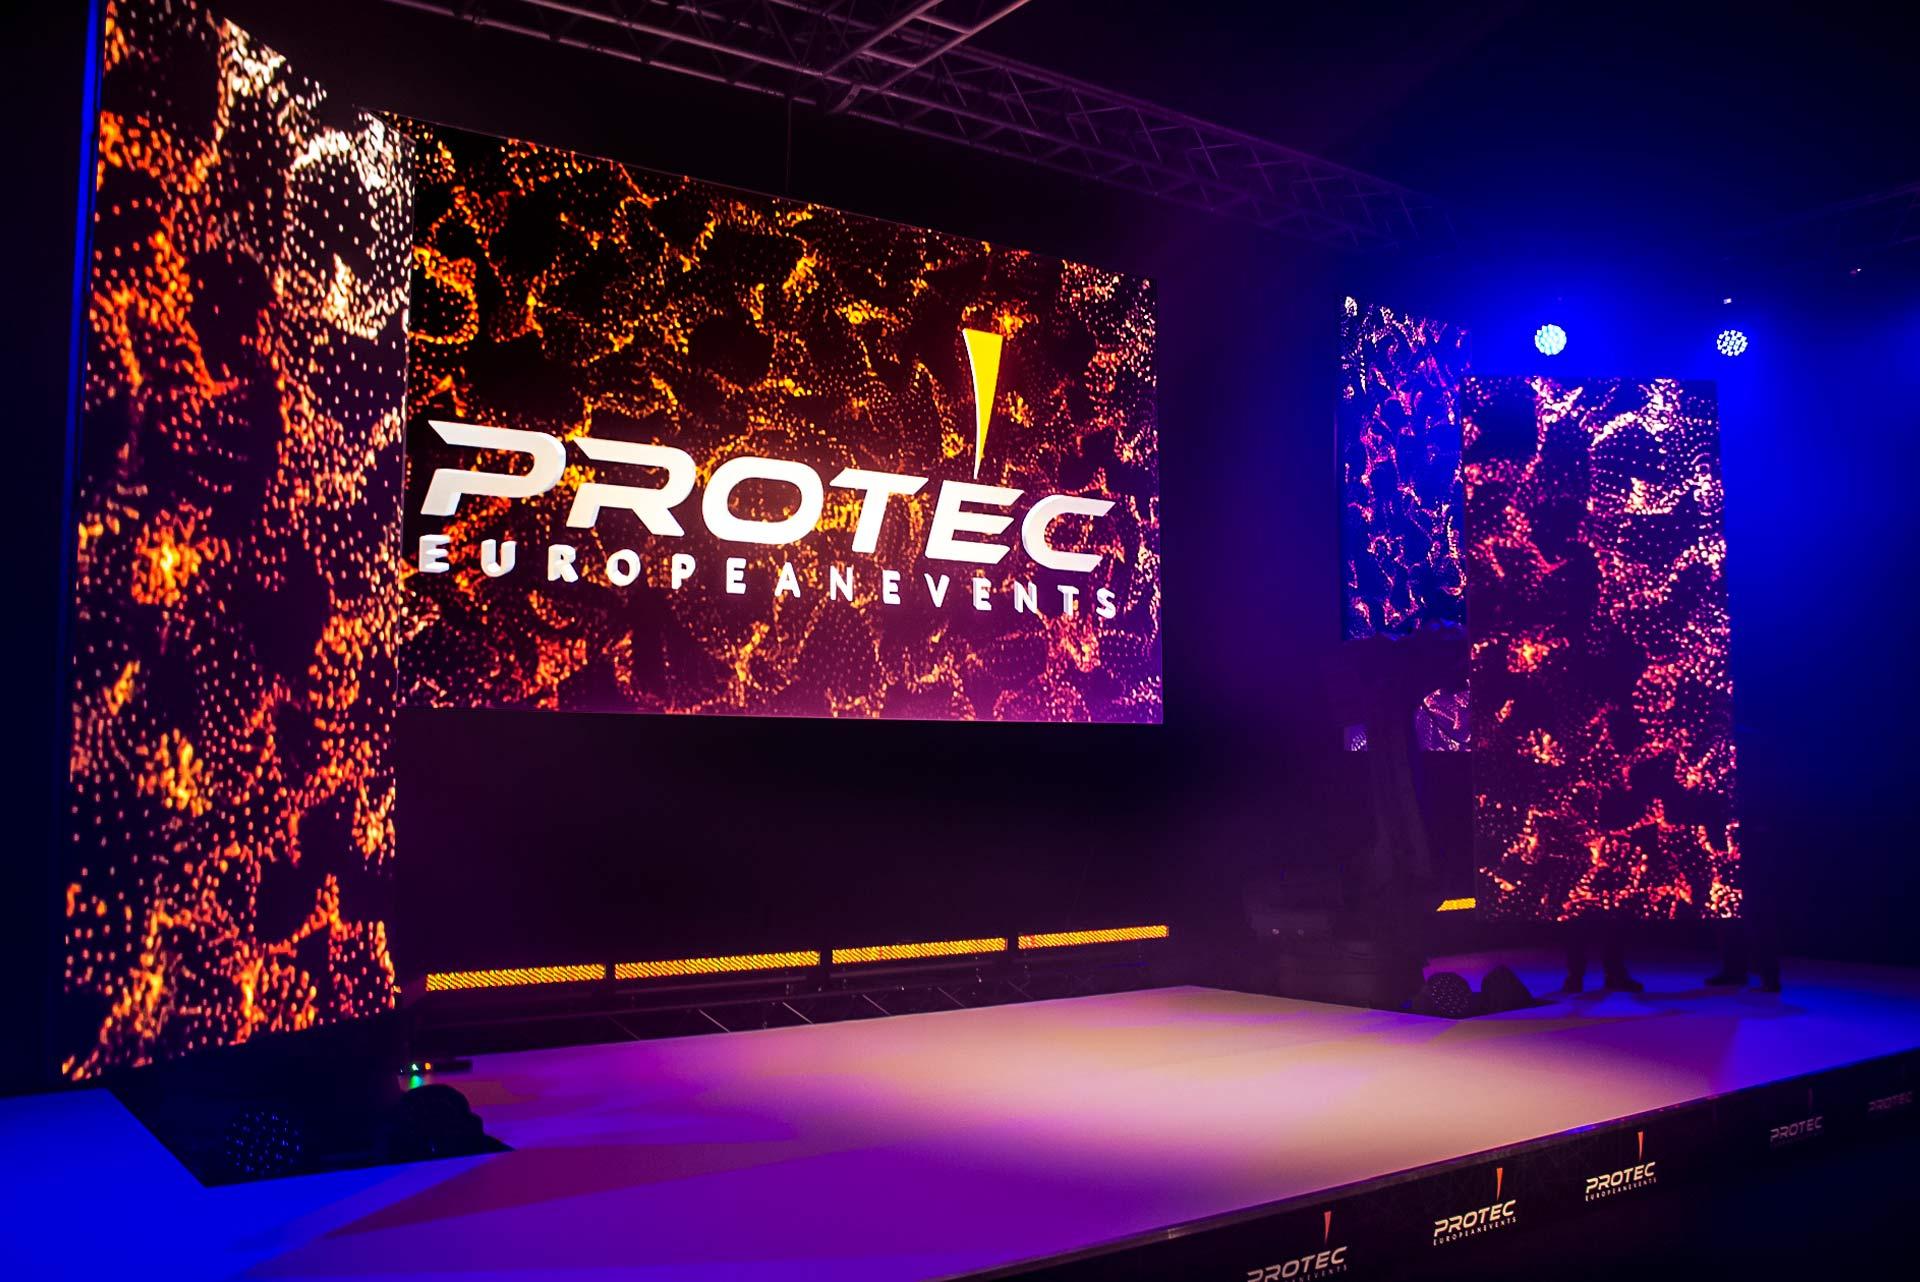 Protec European Events Image